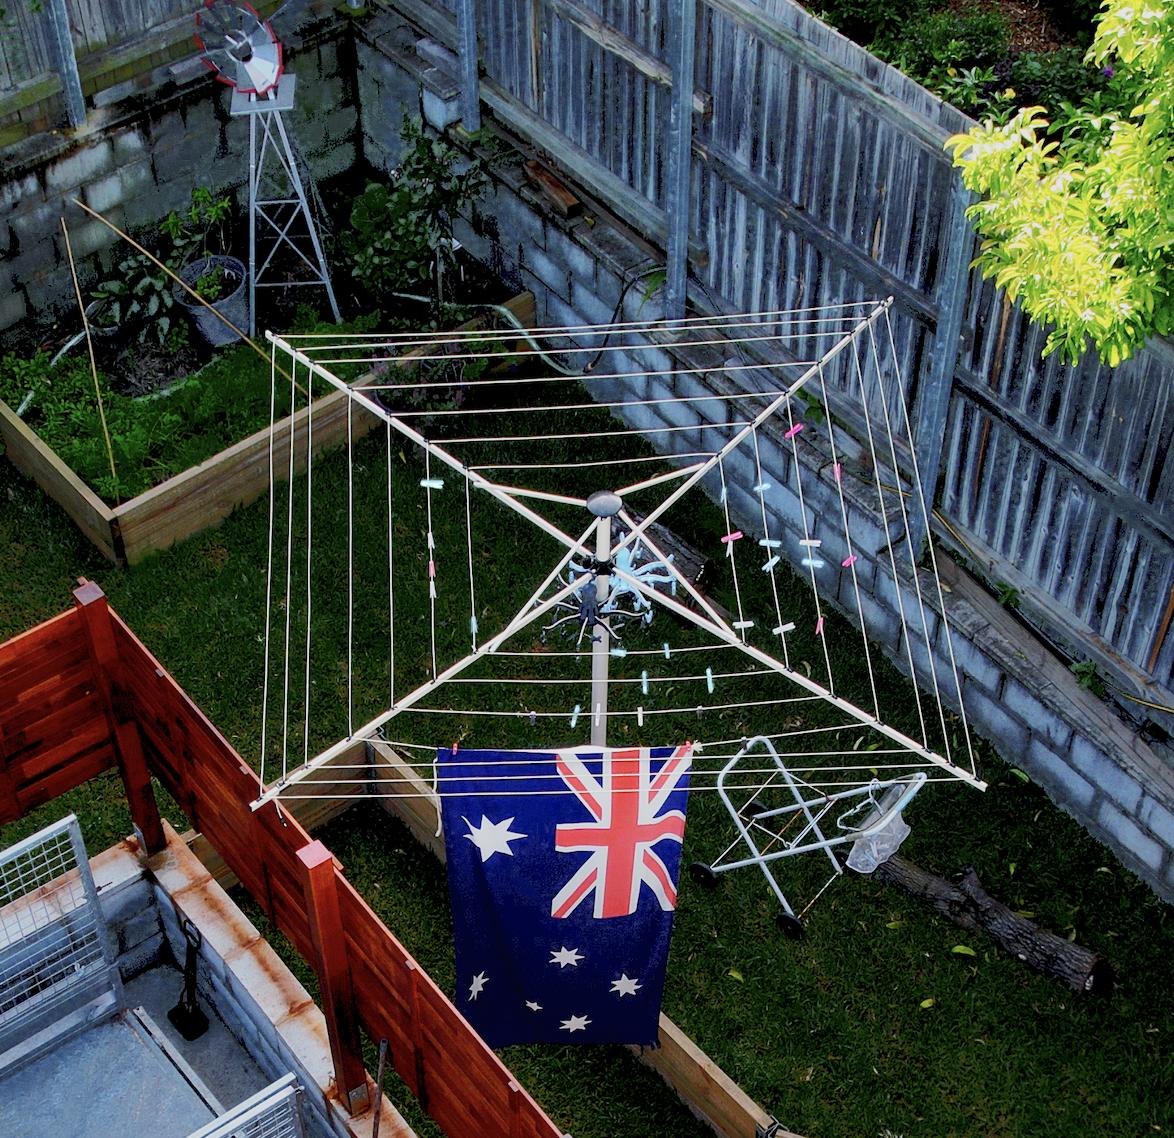 Aussie flag on a clothesline in bribance back yard.